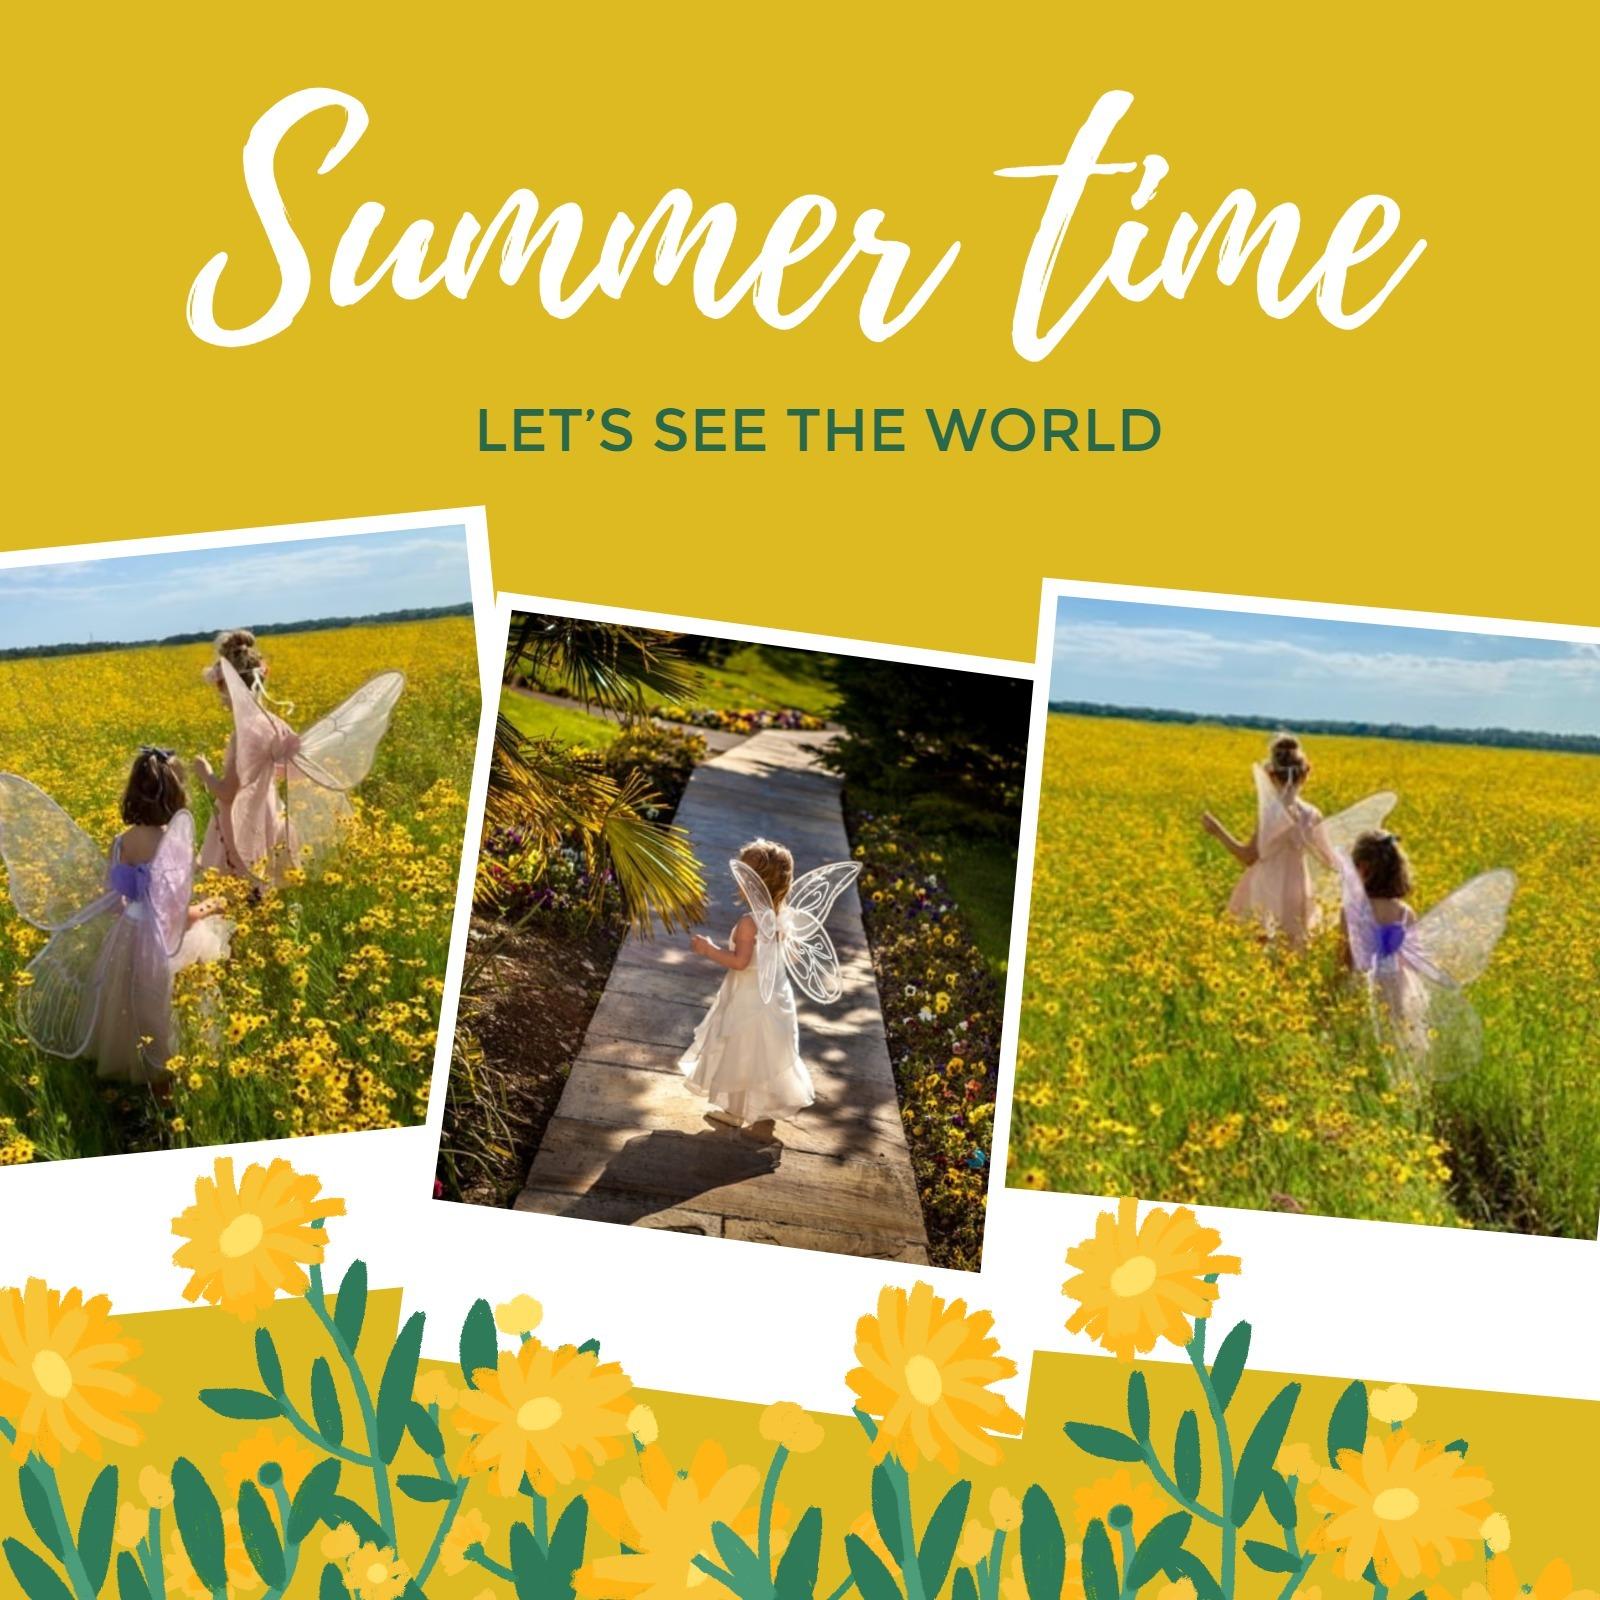 summer1_wl_20200228